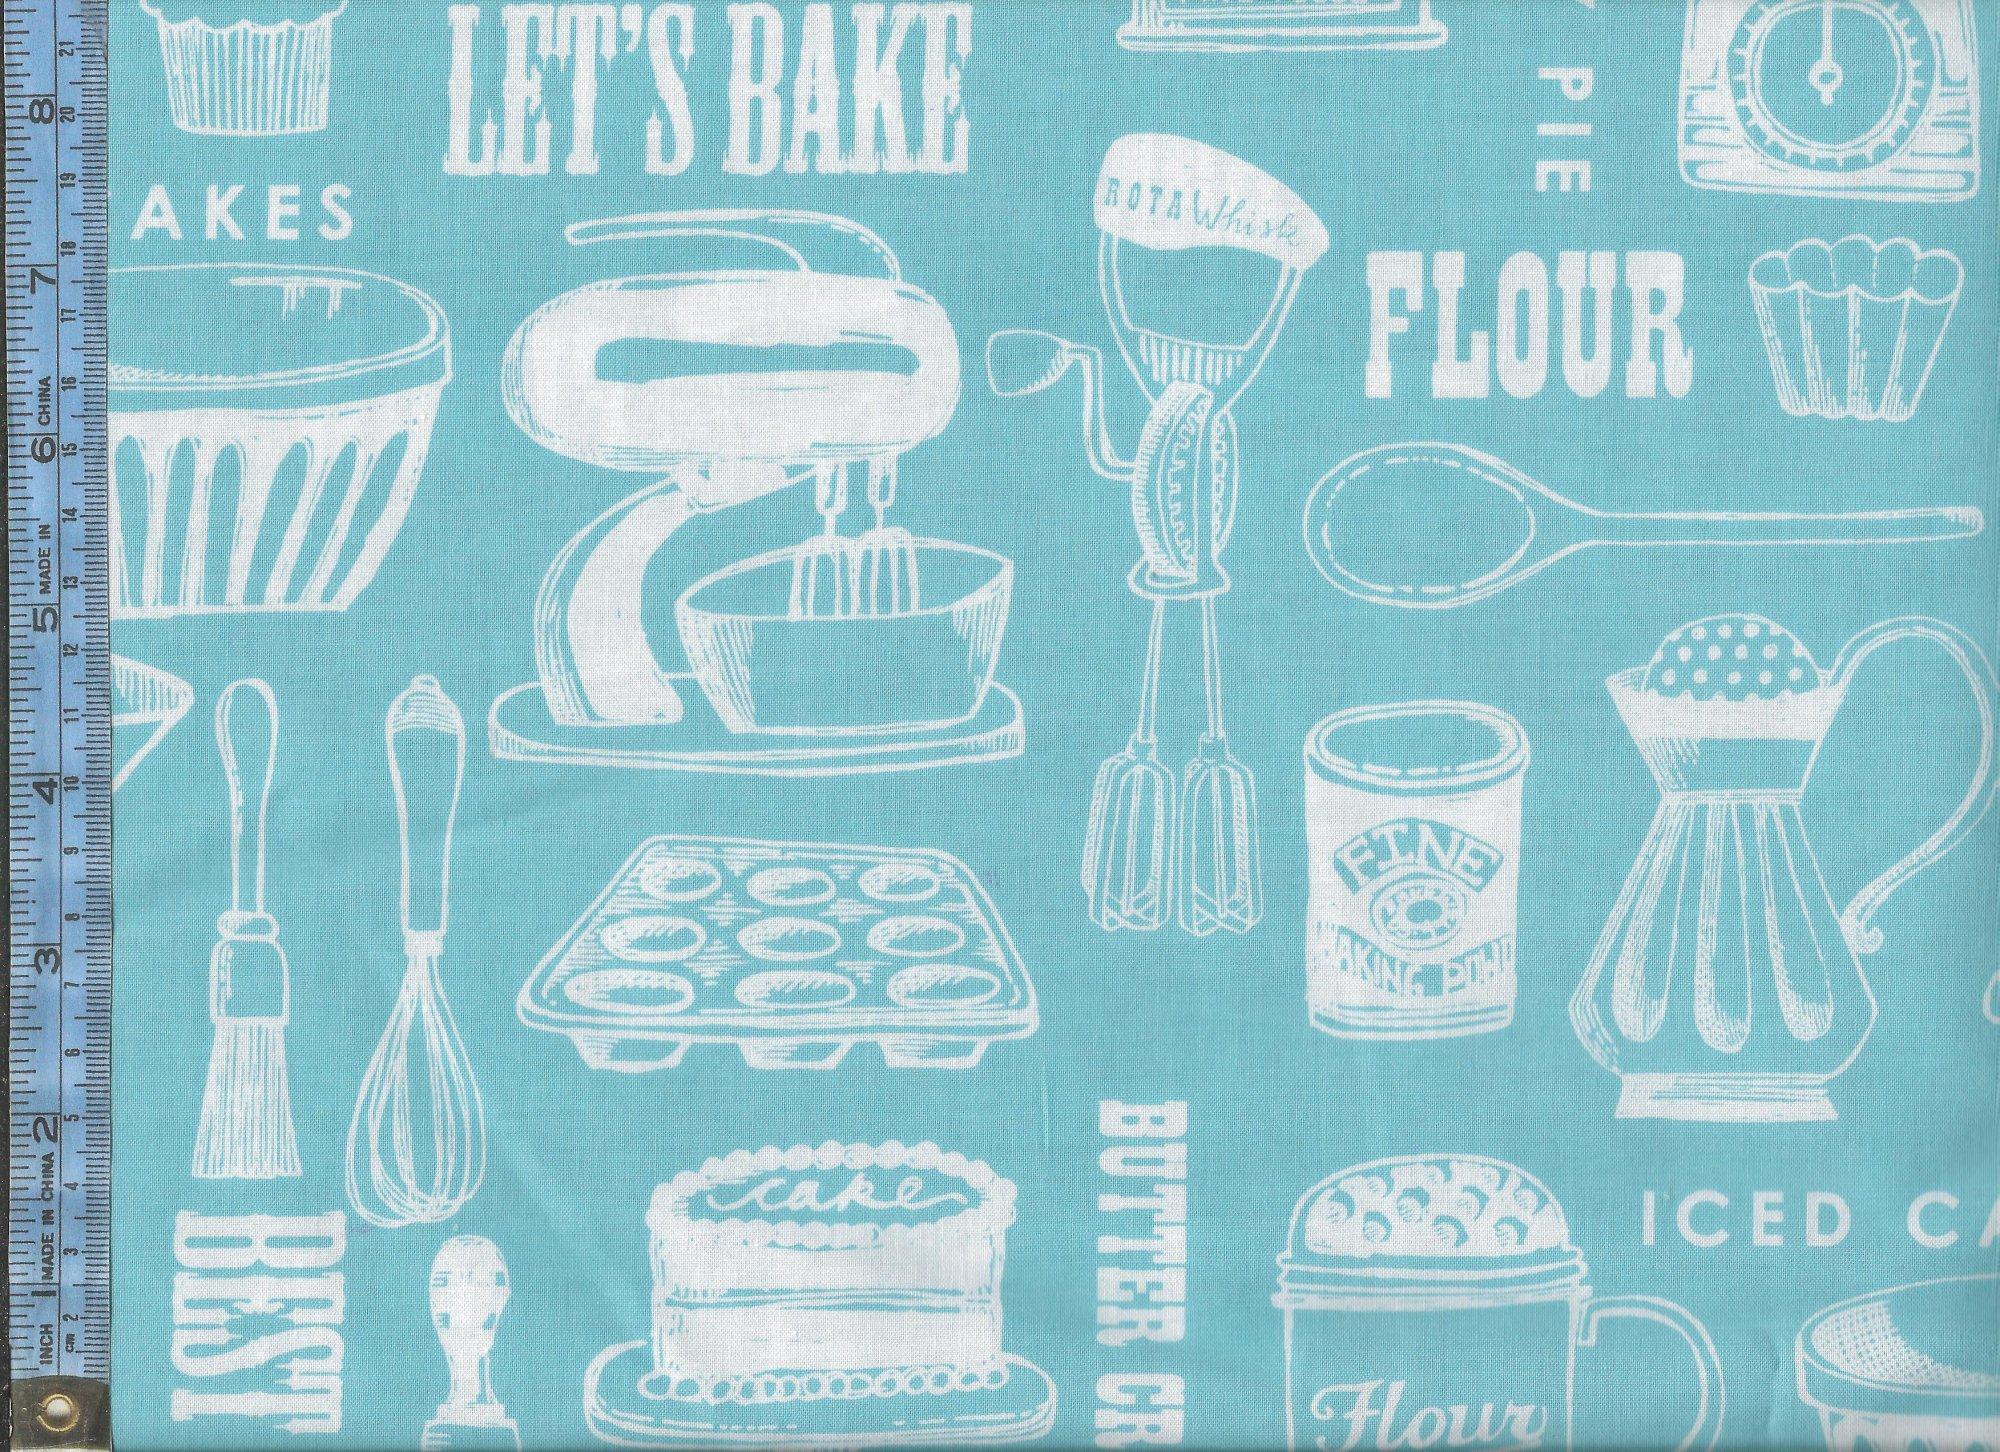 cream - white kitchen utensils on turquoise background